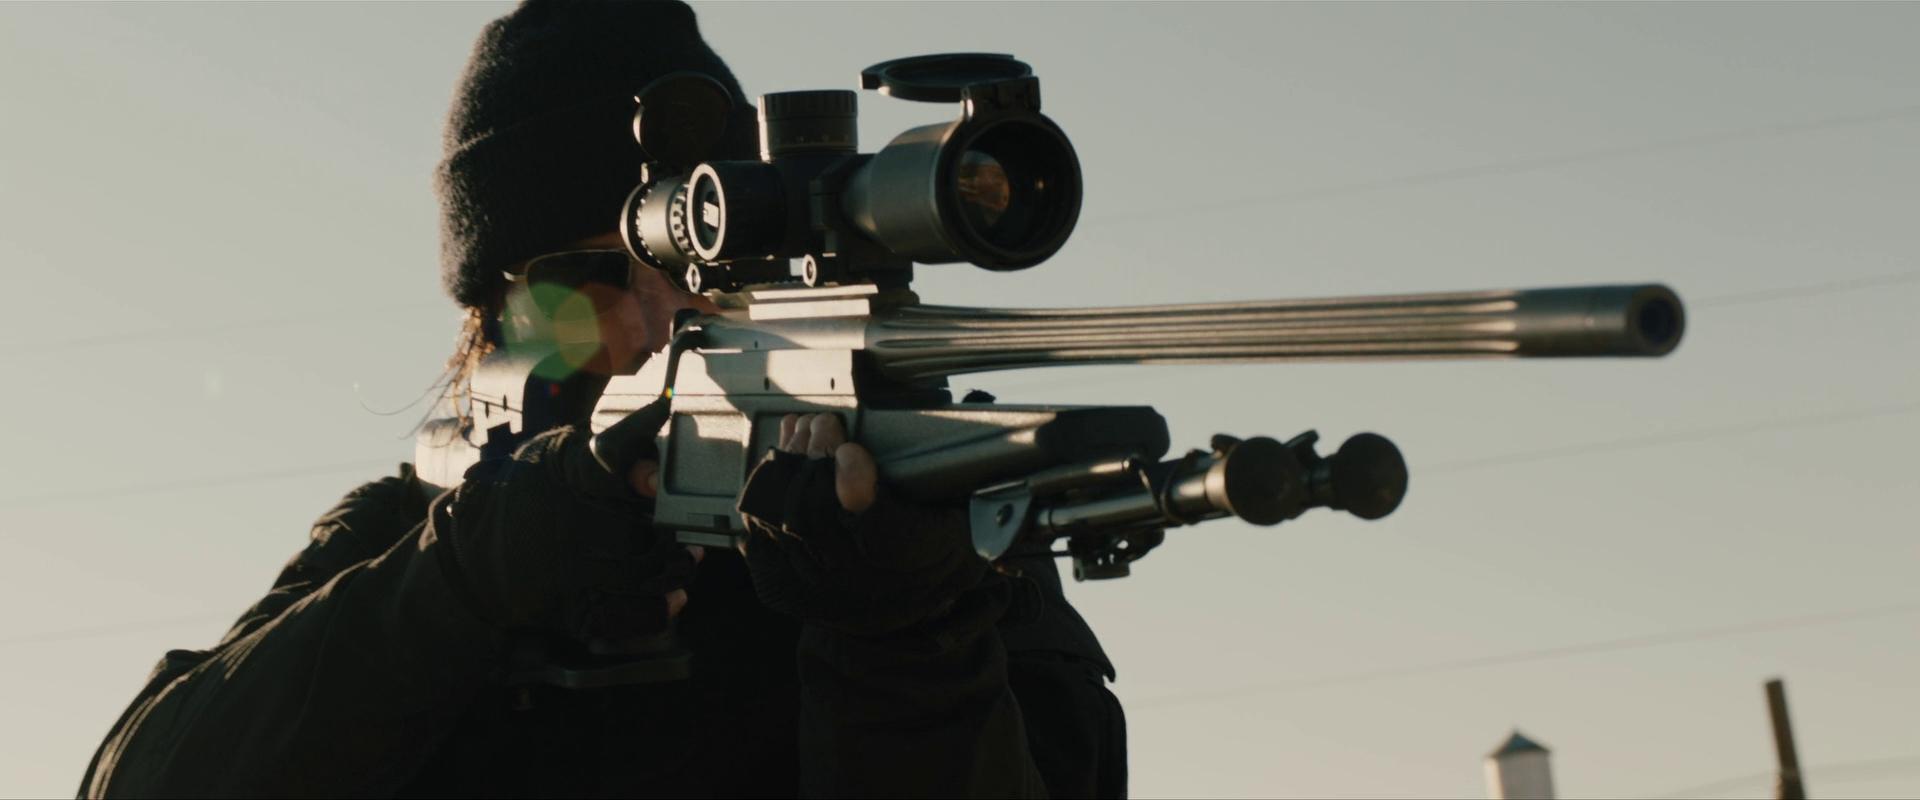 Arma de vanatoare BLASER R93 in filme(Last Stand)